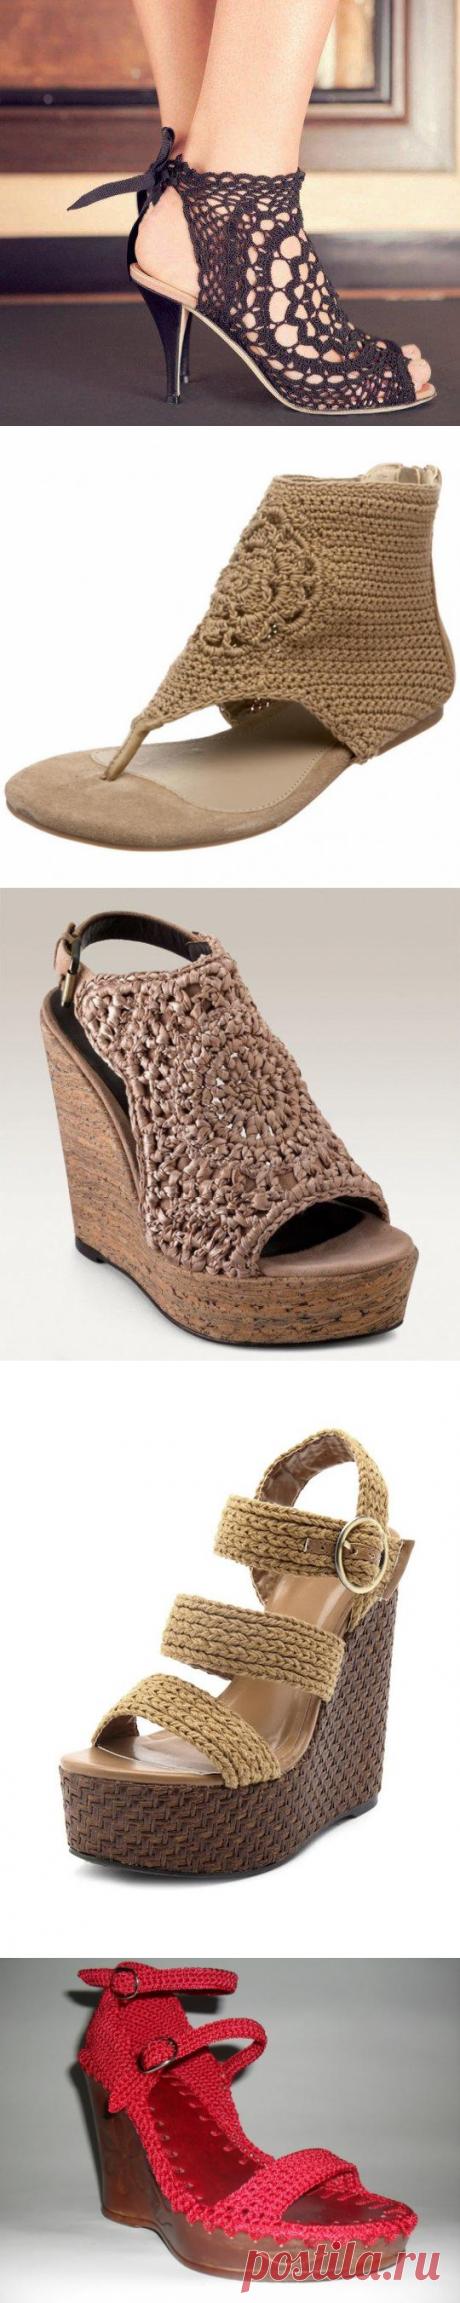 Вязаная летняя обувь - Ярмарка Мастеров - ручная работа, handmade